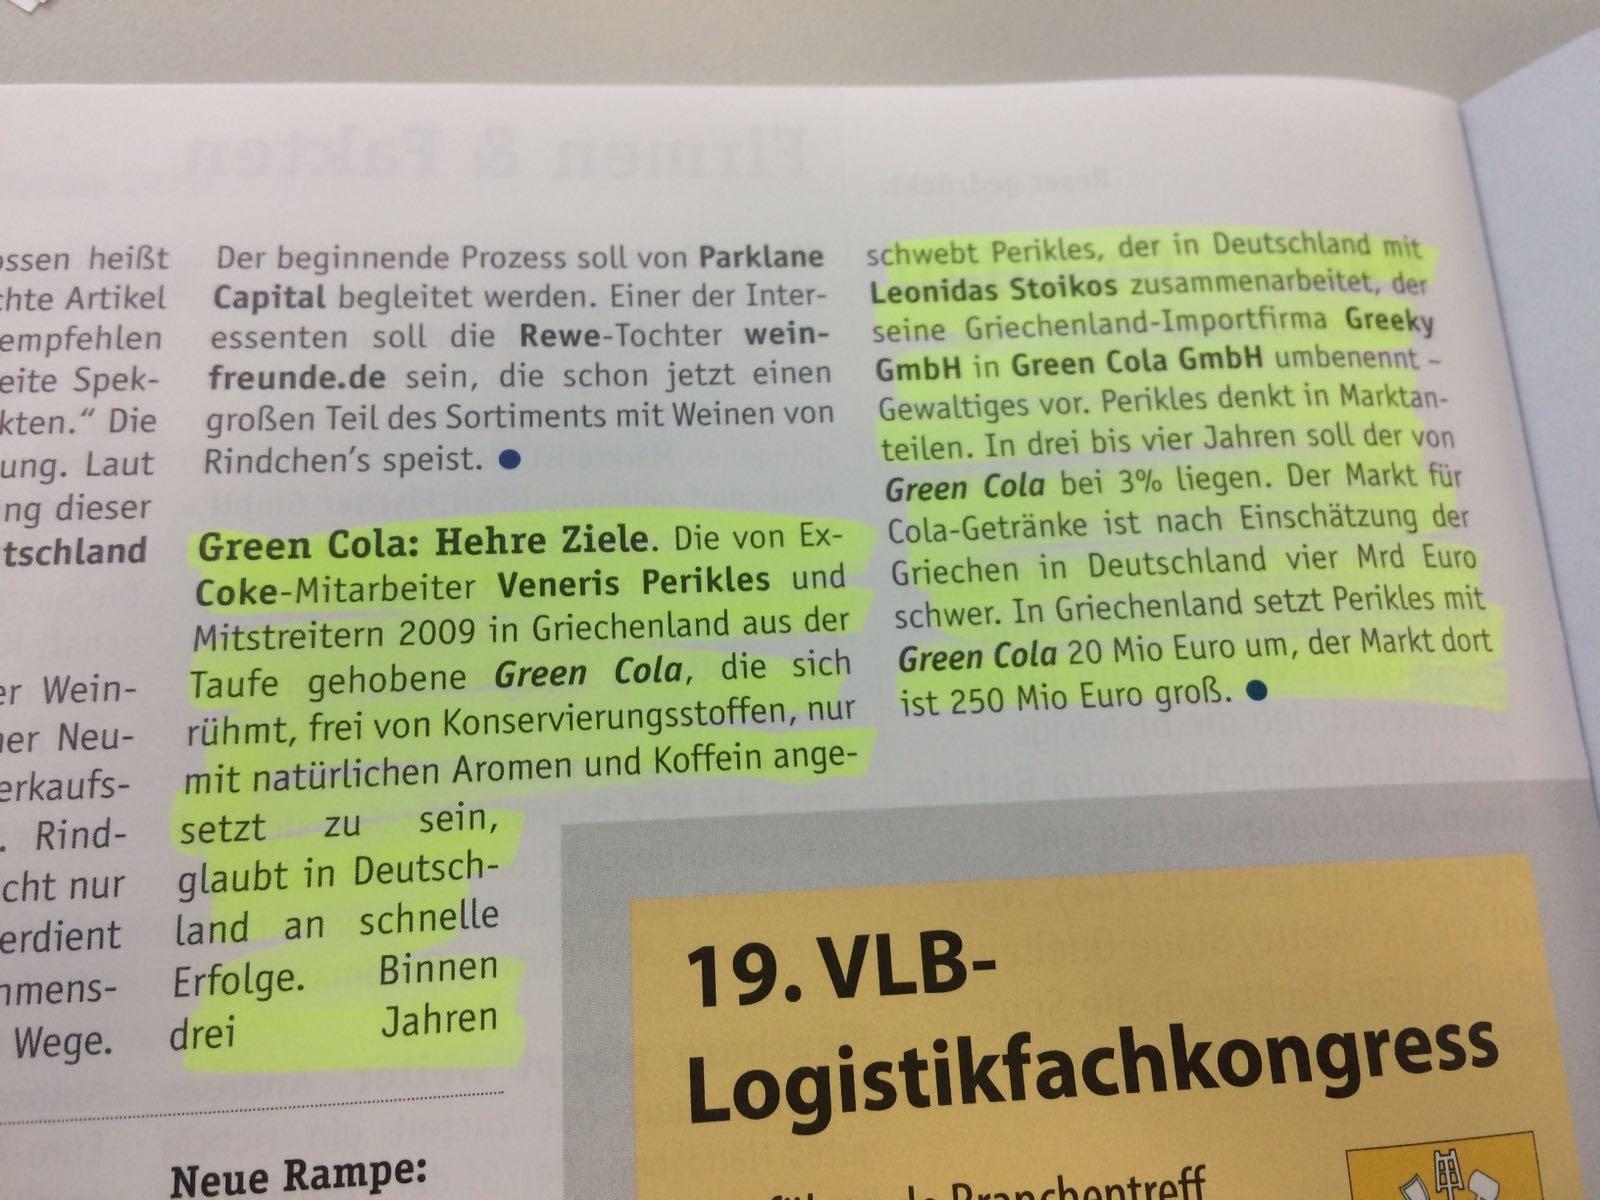 bericht-im-inside-getranke-magazin-am-12-02-2016